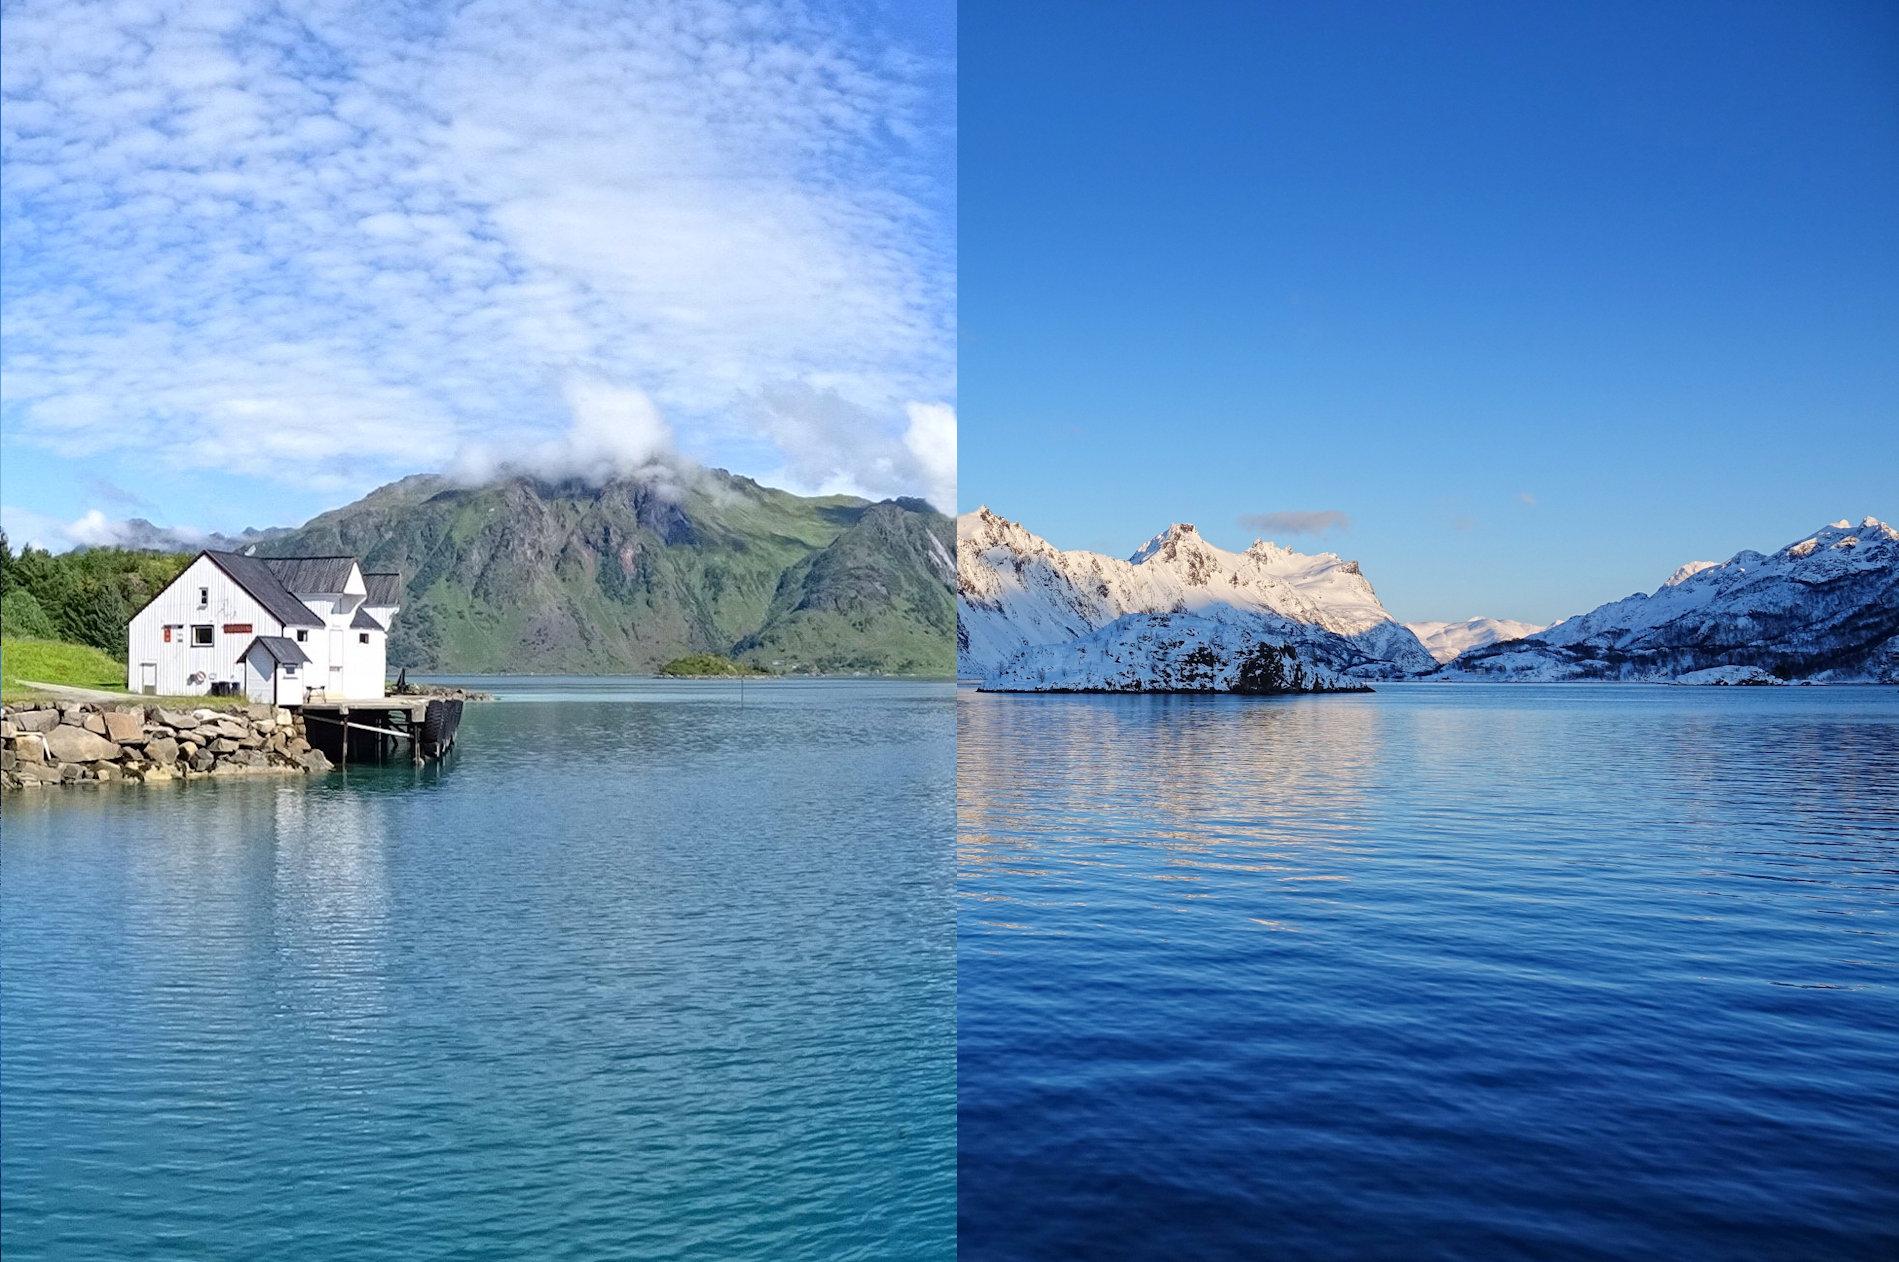 When to visit Lofoten, Norway - Summer or Winter.